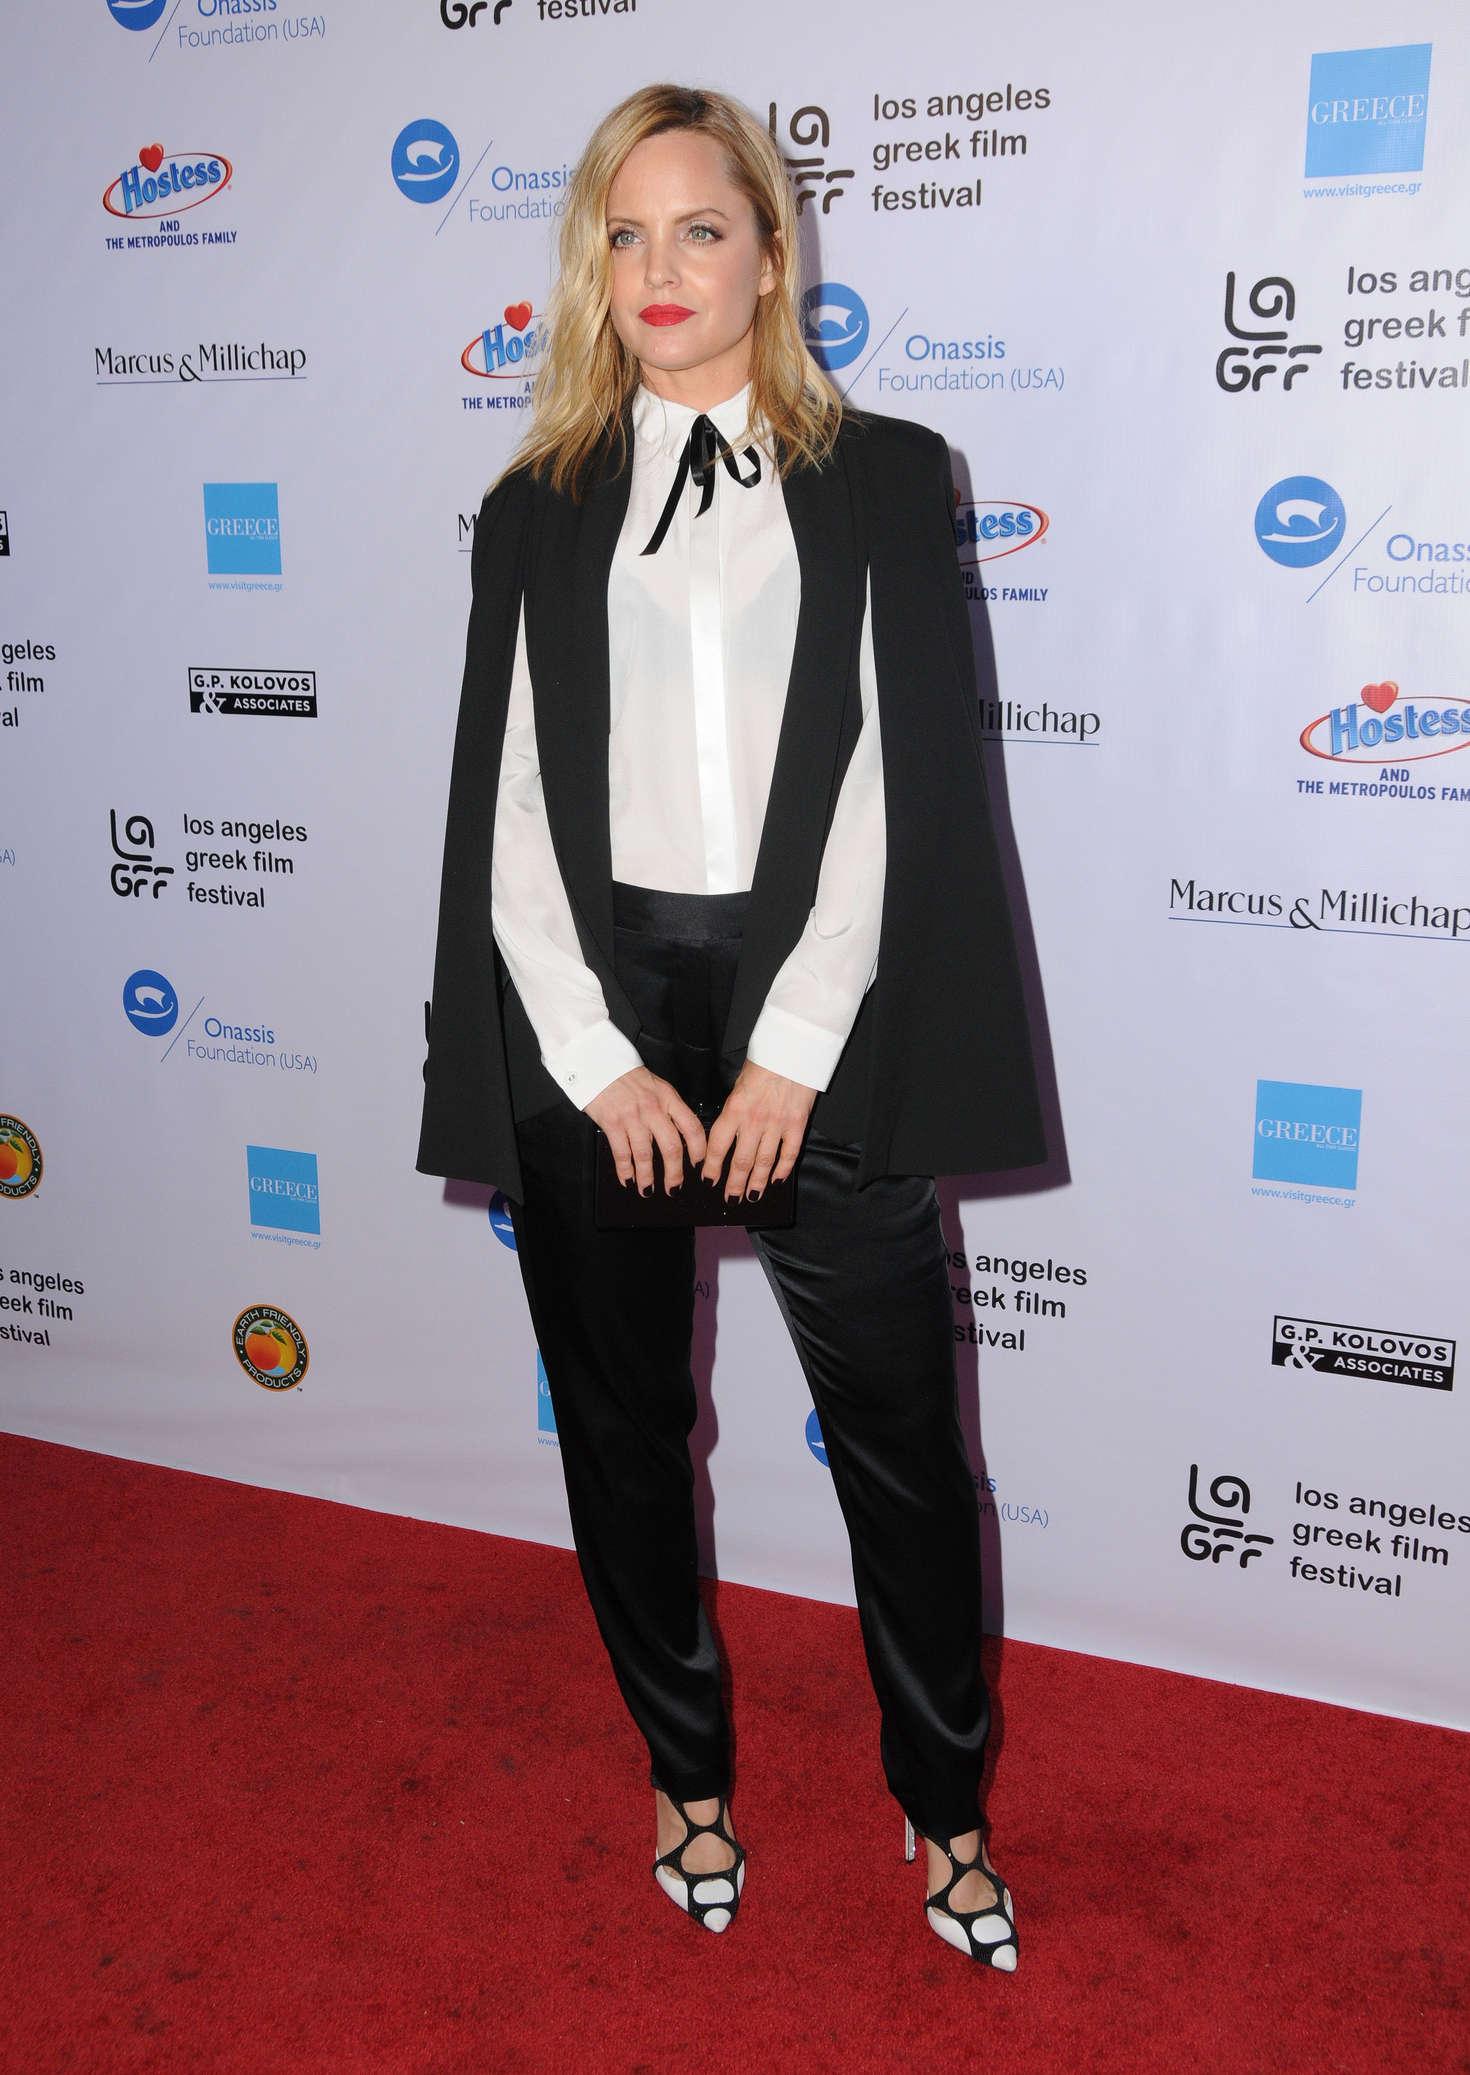 Mena Suvari 2016 : Mena Suvari: Worlds Apart Premiere at 2016 LA Greek Film Festival -17